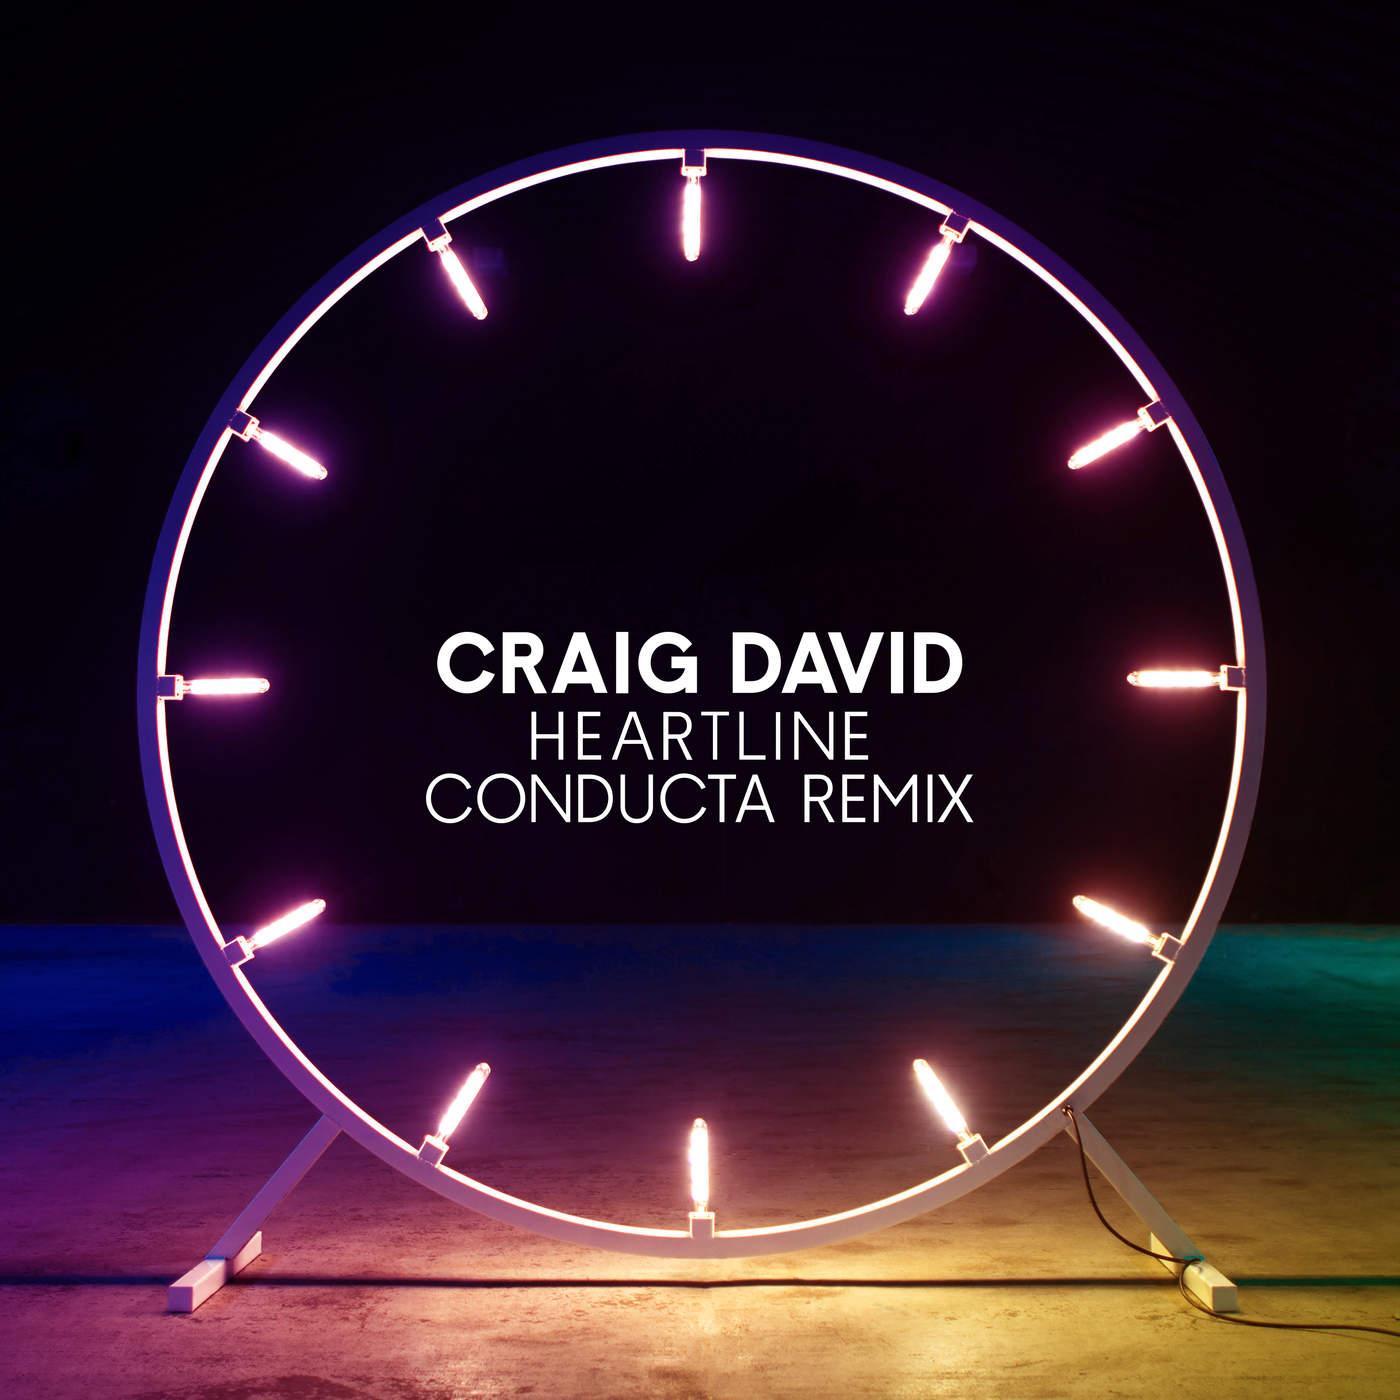 Craig David - Heartline (Conducta Remix) - Single